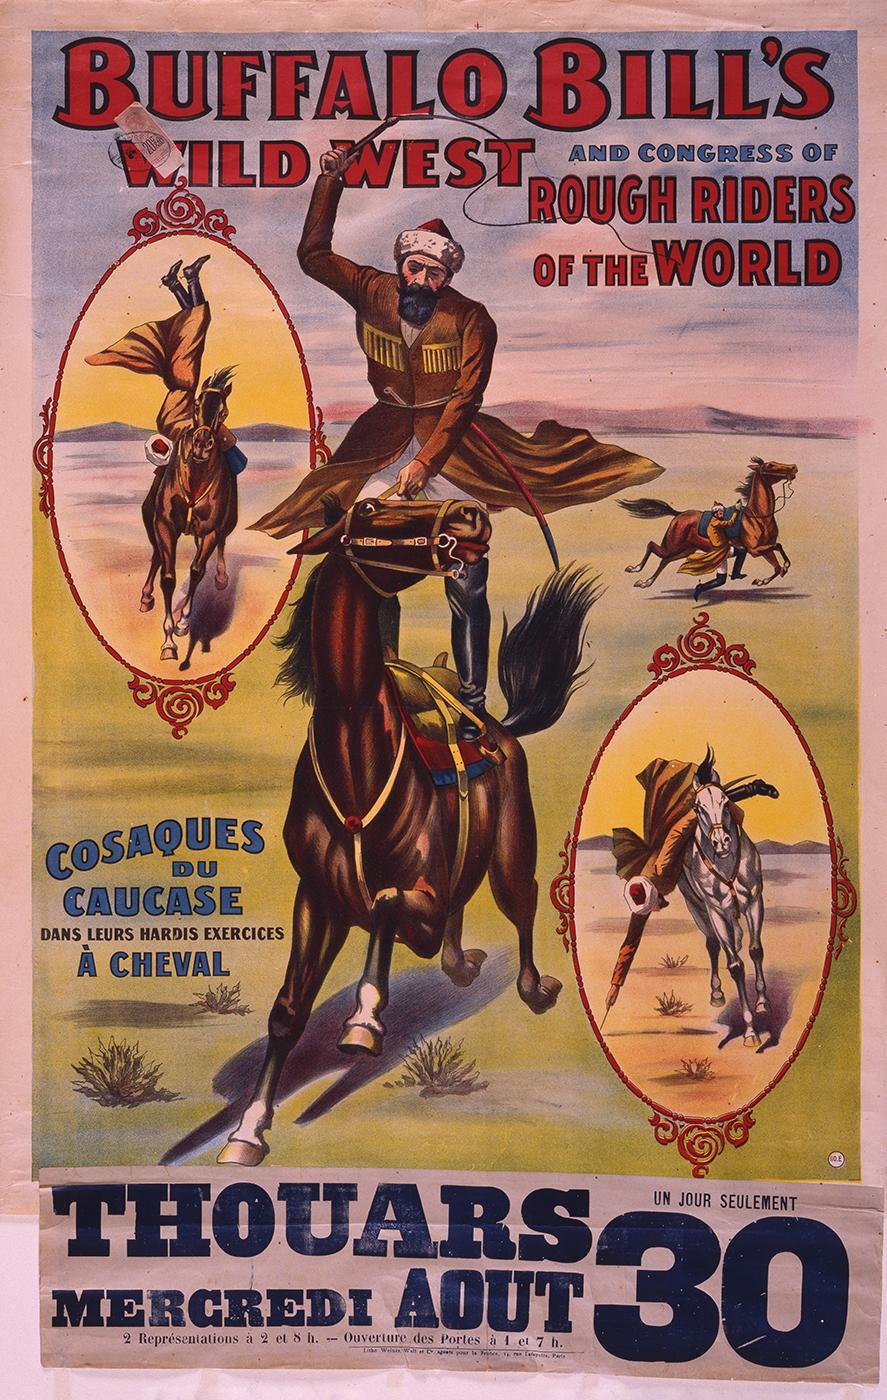 Cossacks on Horseback Wild West poster, France, 1905. 1.69.2175